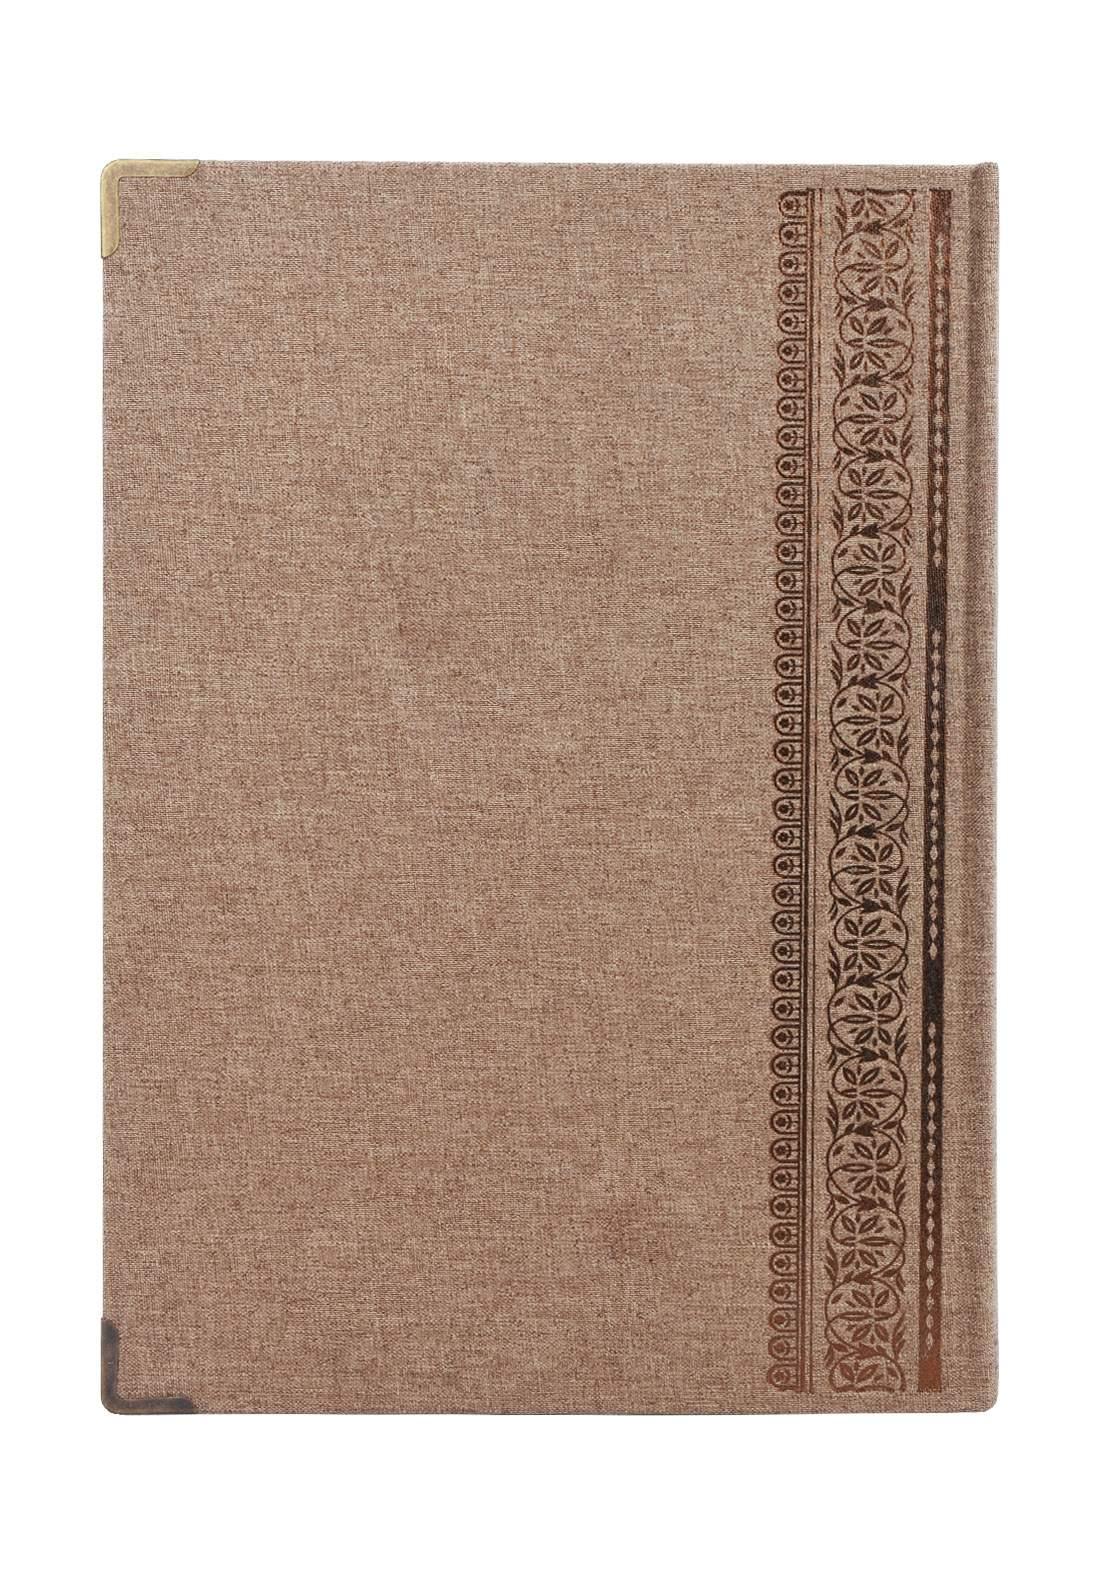 Tarsi (1438-2007)160 Sheets Drawing Book دفتر رسم تارسي 160ورقة